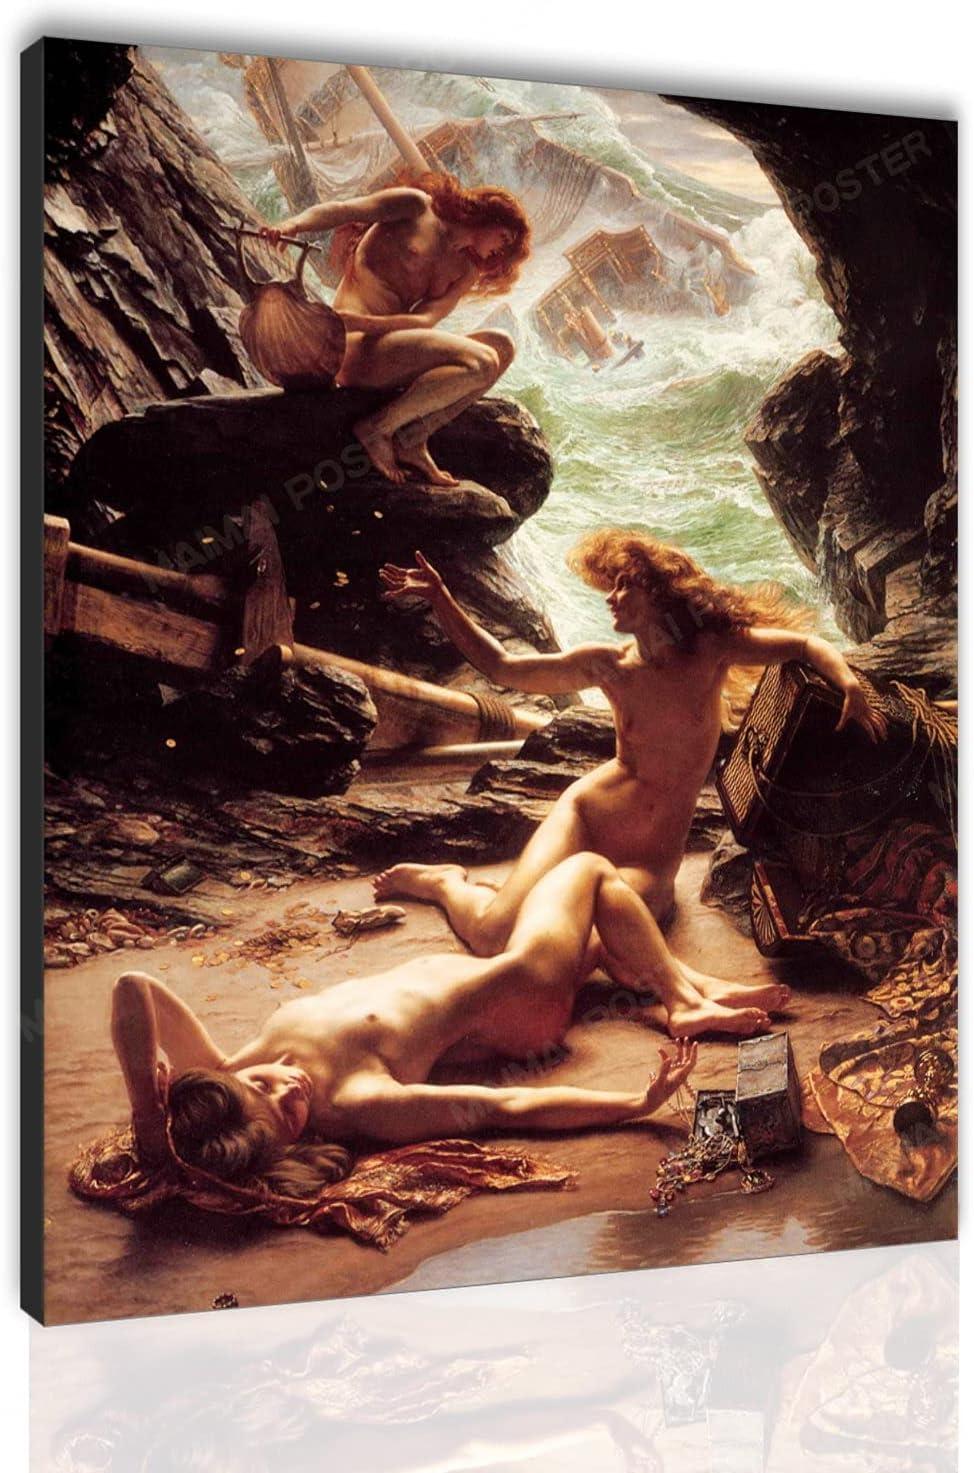 Female 日本製 Body Art Poster Vintage 祝開店大放出セール開催中 W Nude Painting Oil